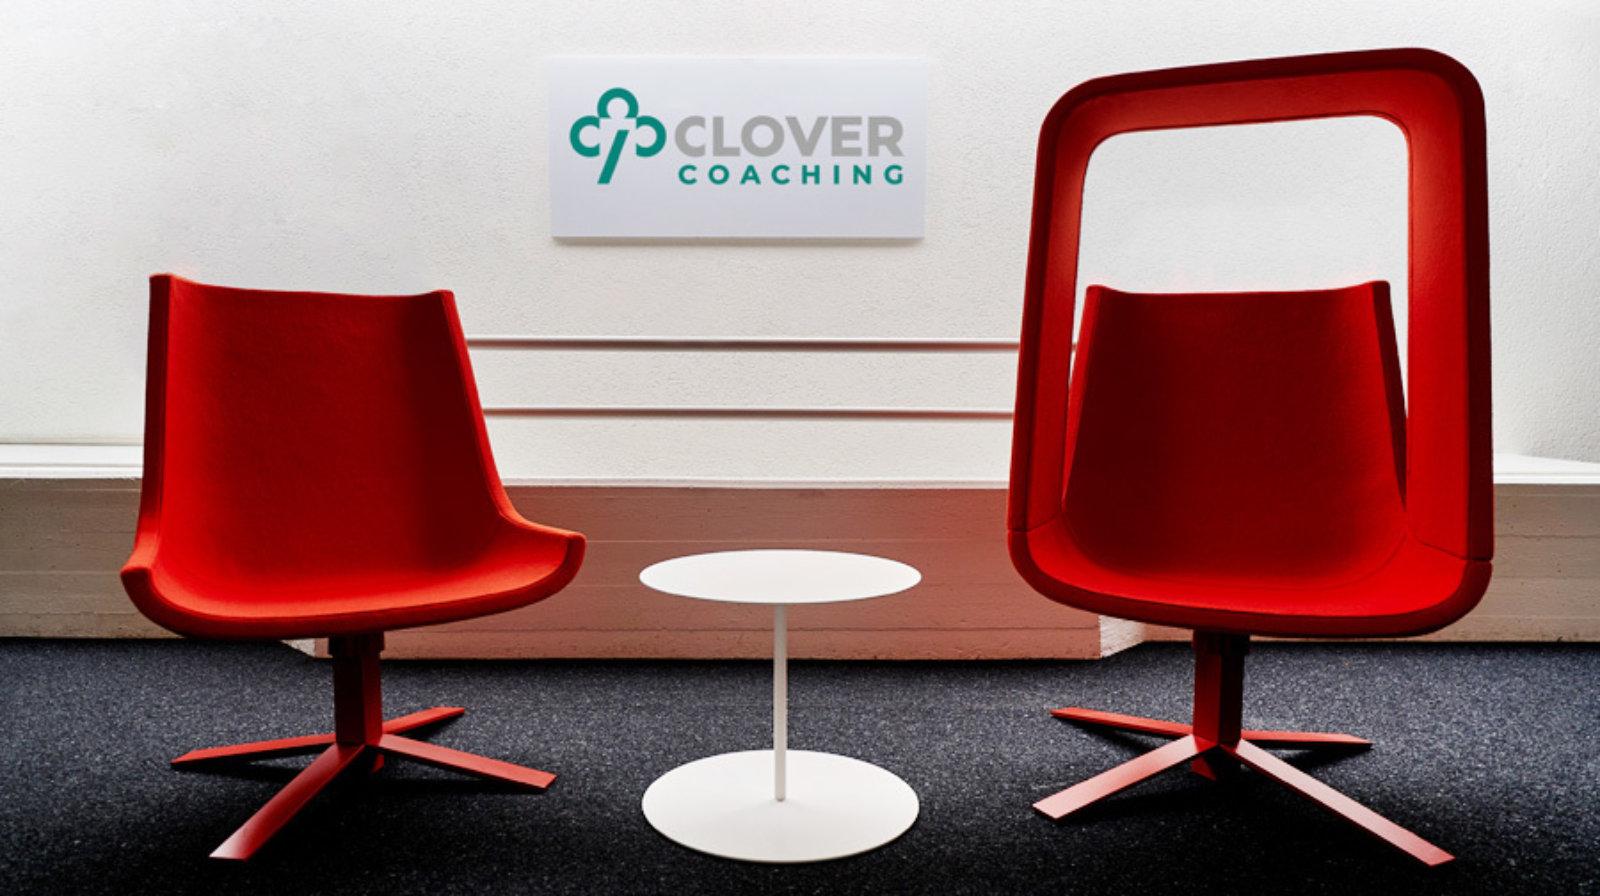 Arbeiten bei Clovercoaching